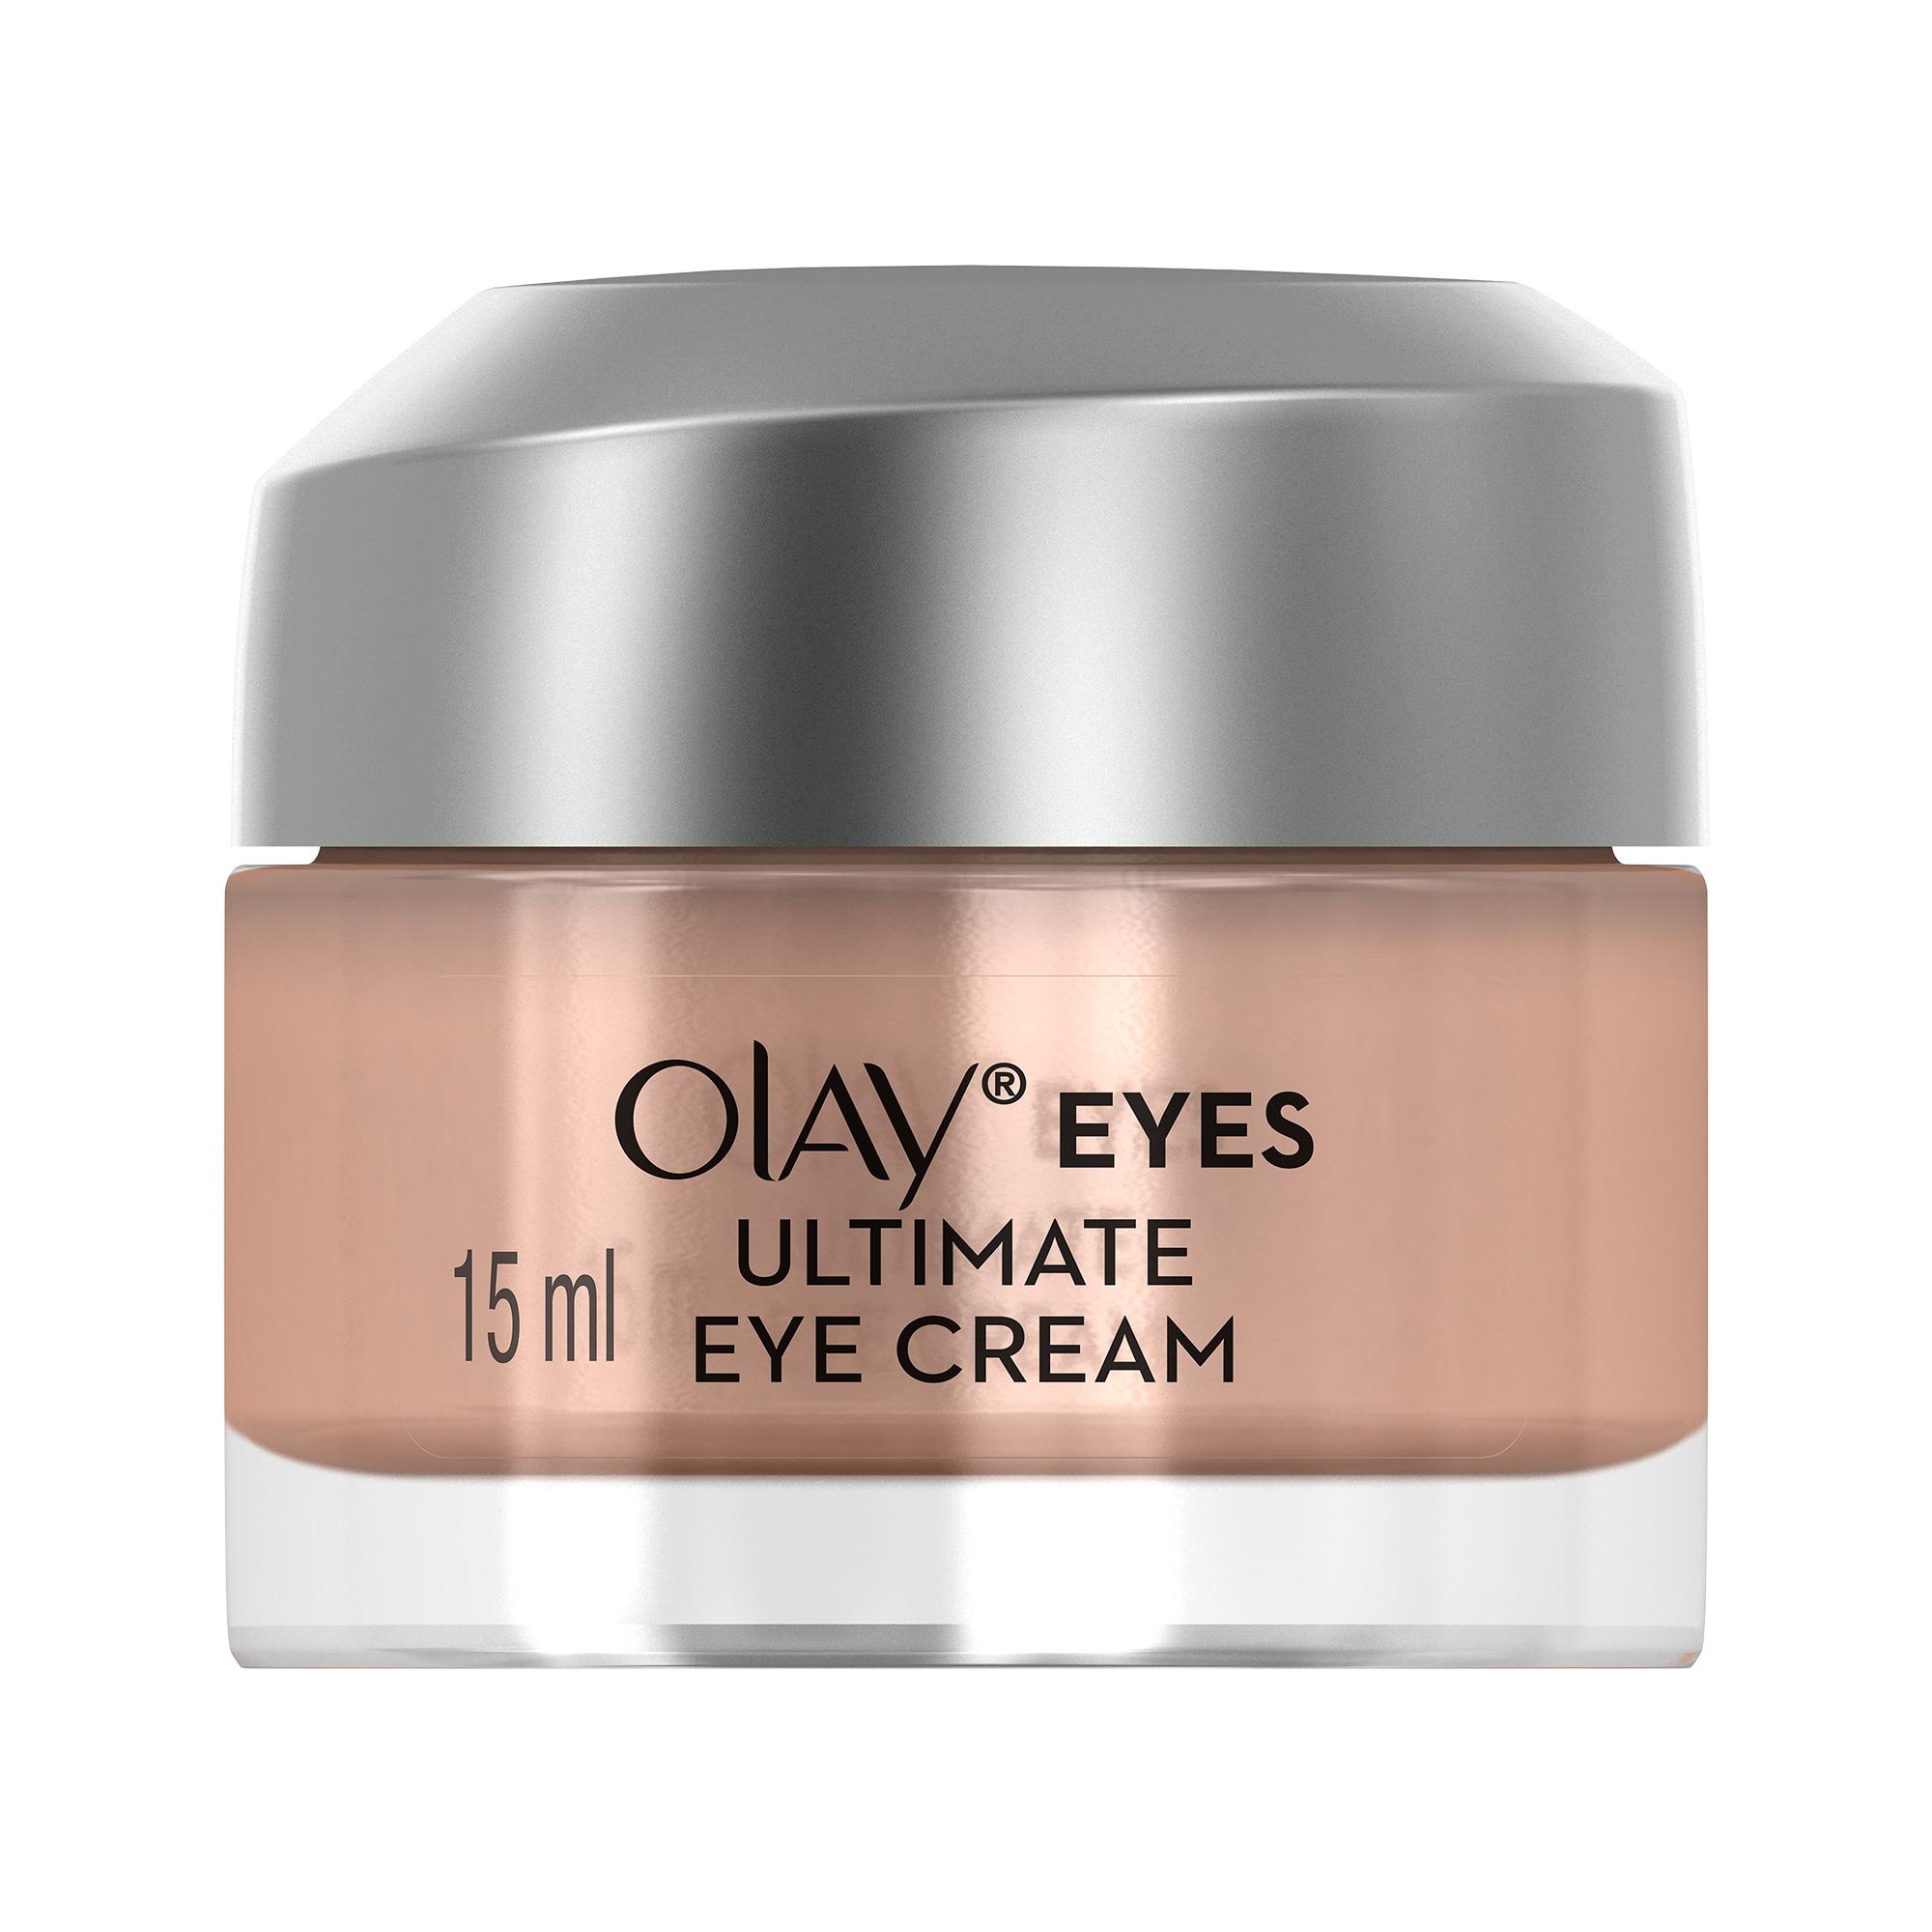 Olay Ultimate Eye Cream